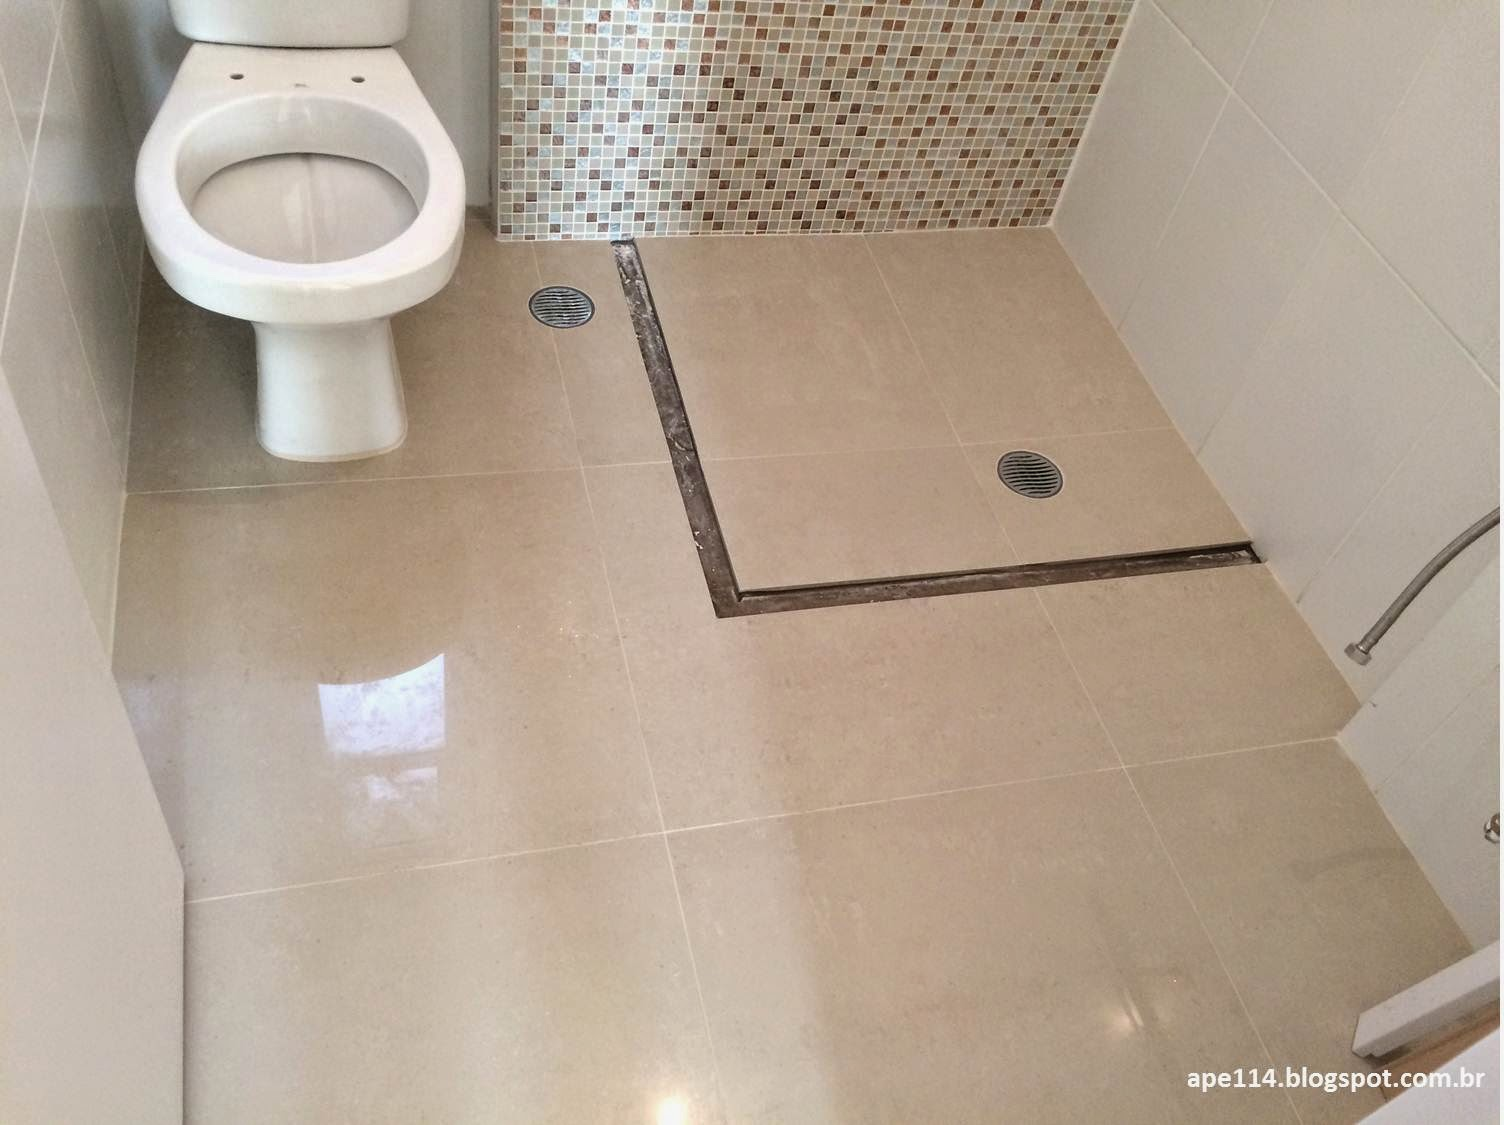 Apê 114: Novembro 2014 #5F4D3E 1504x1125 Azulejo Fosco Banheiro